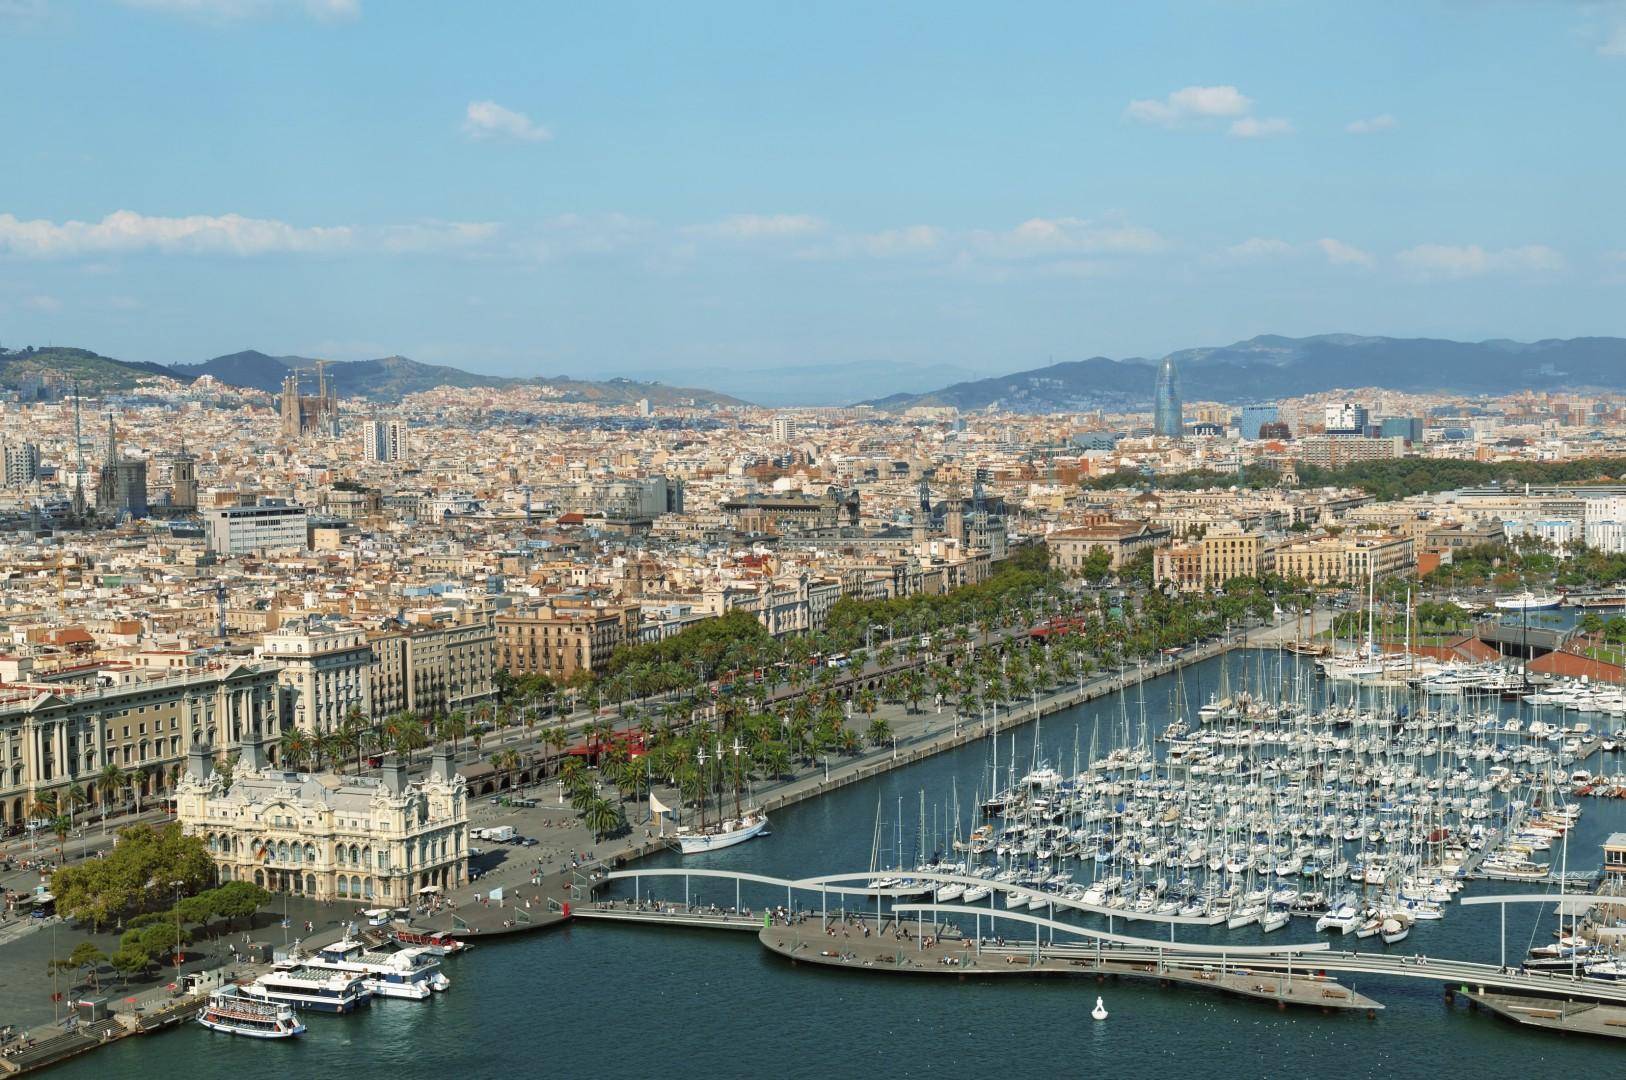 Barcelona skyline, includes: Port Vell, Sangrada Familia and Torre Agbar